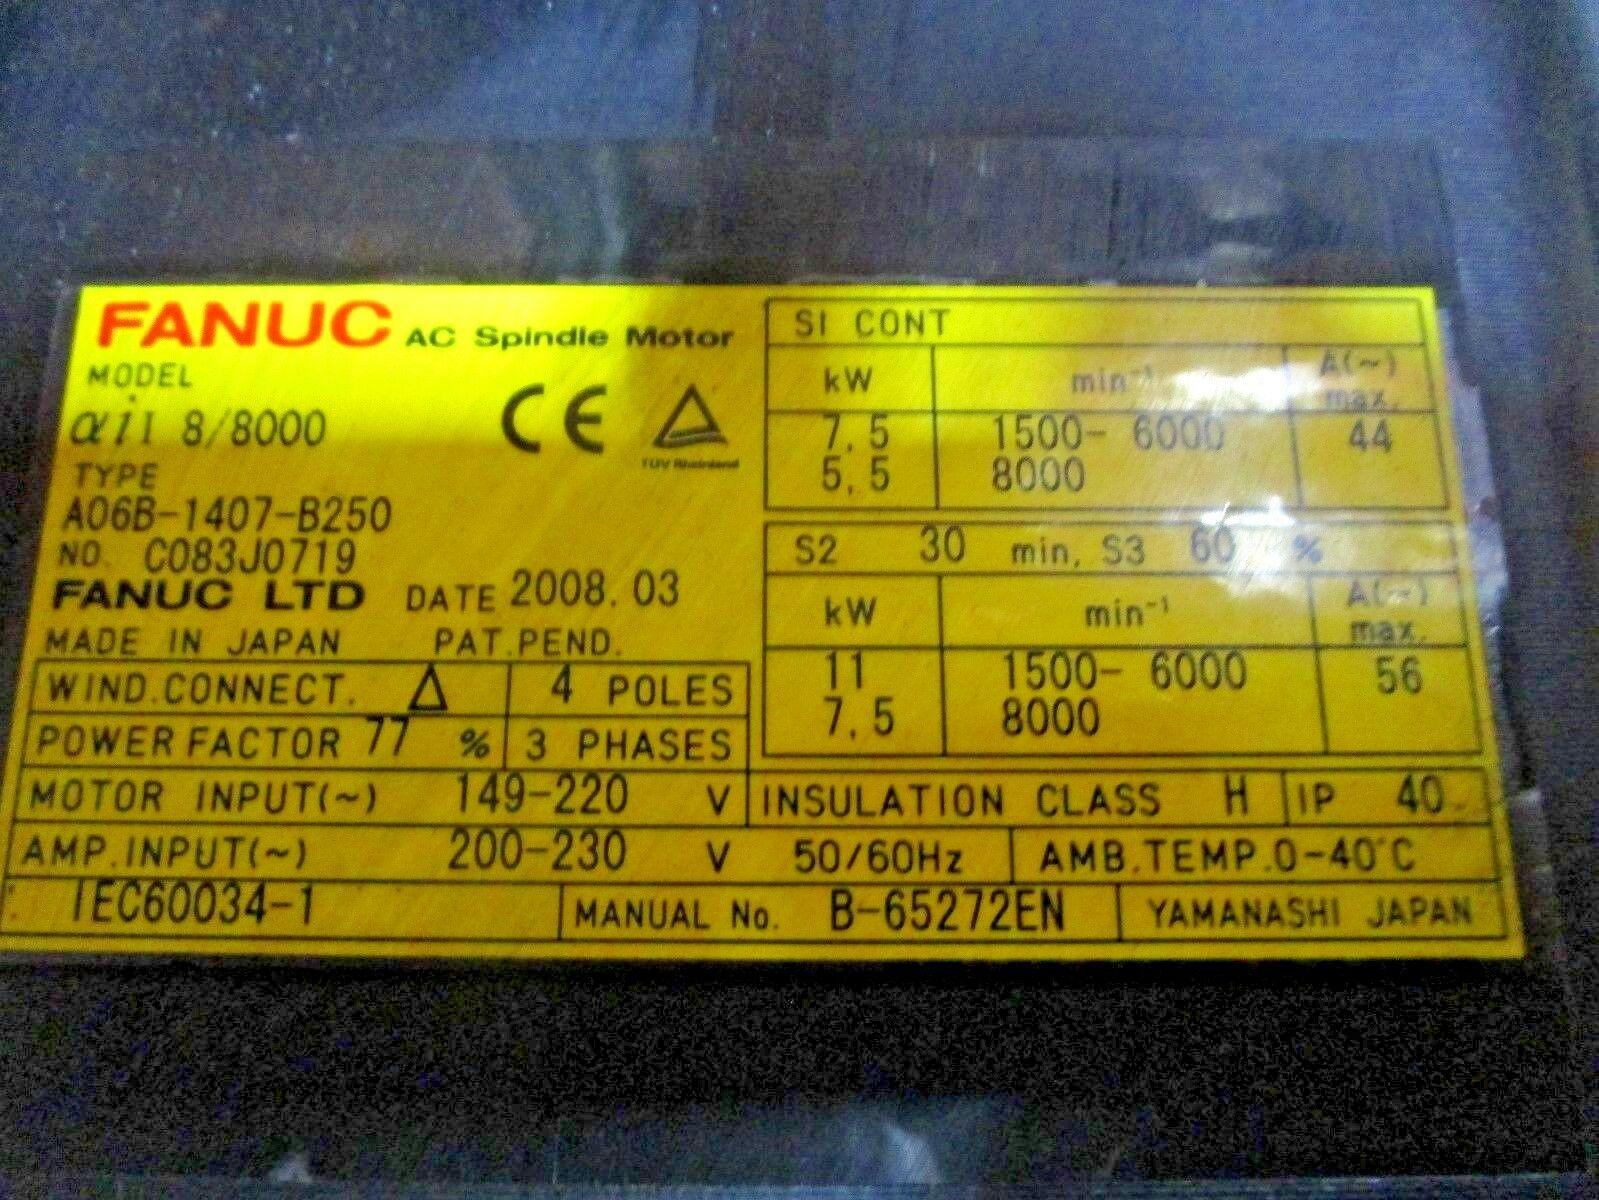 Fanuc Spindle Motor Alpha-iL8/8000 A06B-1407-B250